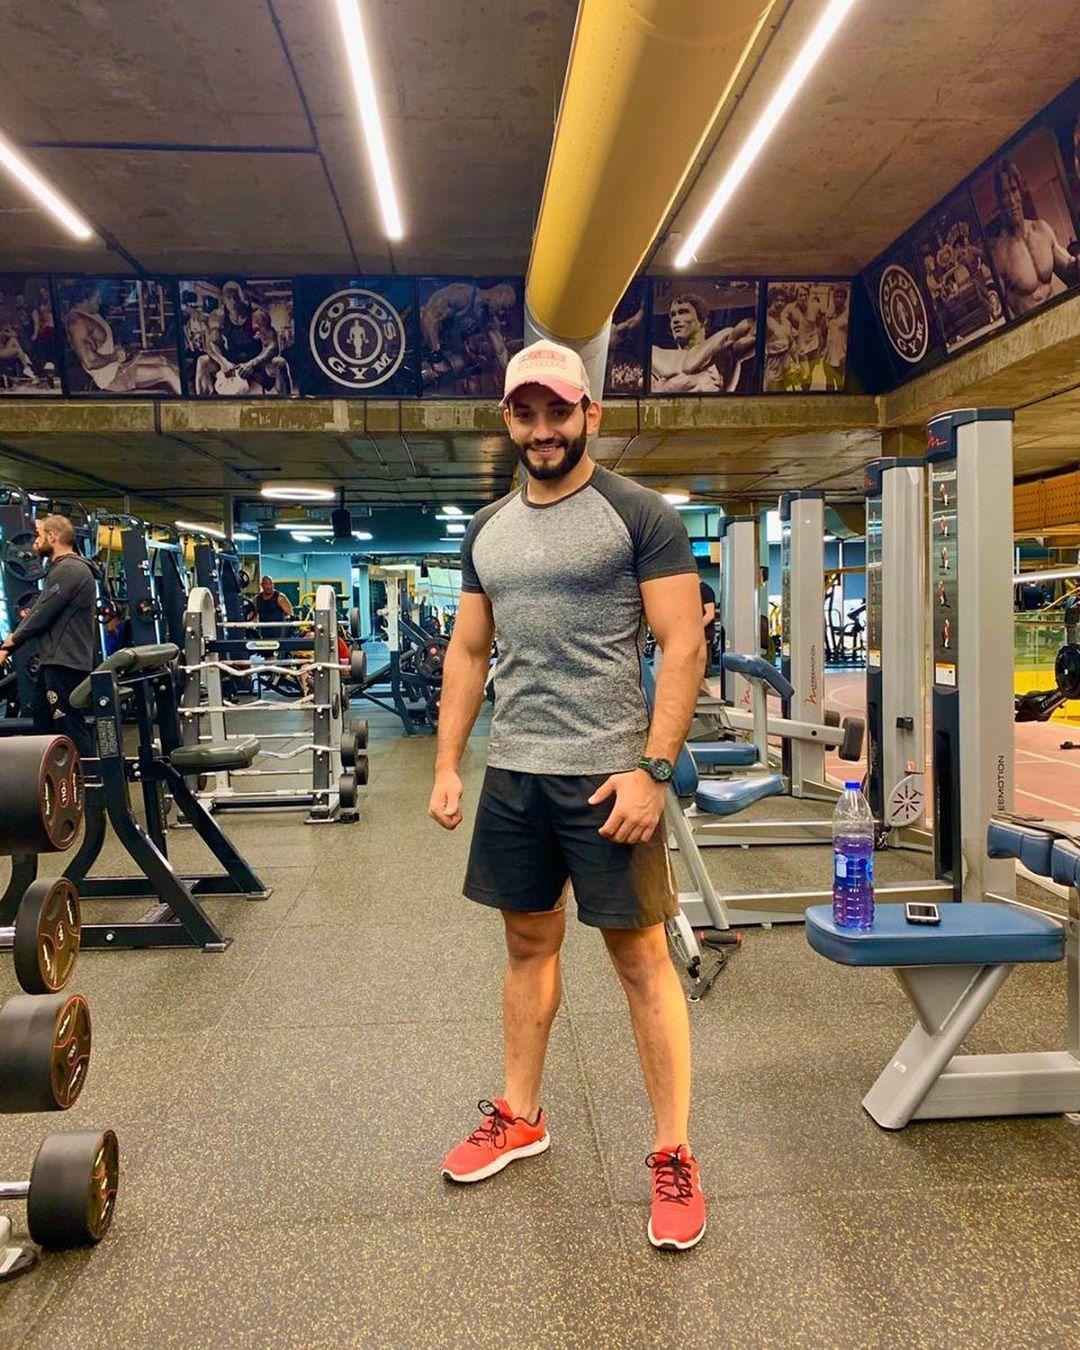 Coach Mothana Aldebei Goldsgym Gym Workoutmotivation Fit Instagram Amman Fitness Goldsgym Goldsgymjordan Golds Gym Fitness Motivation Fitness